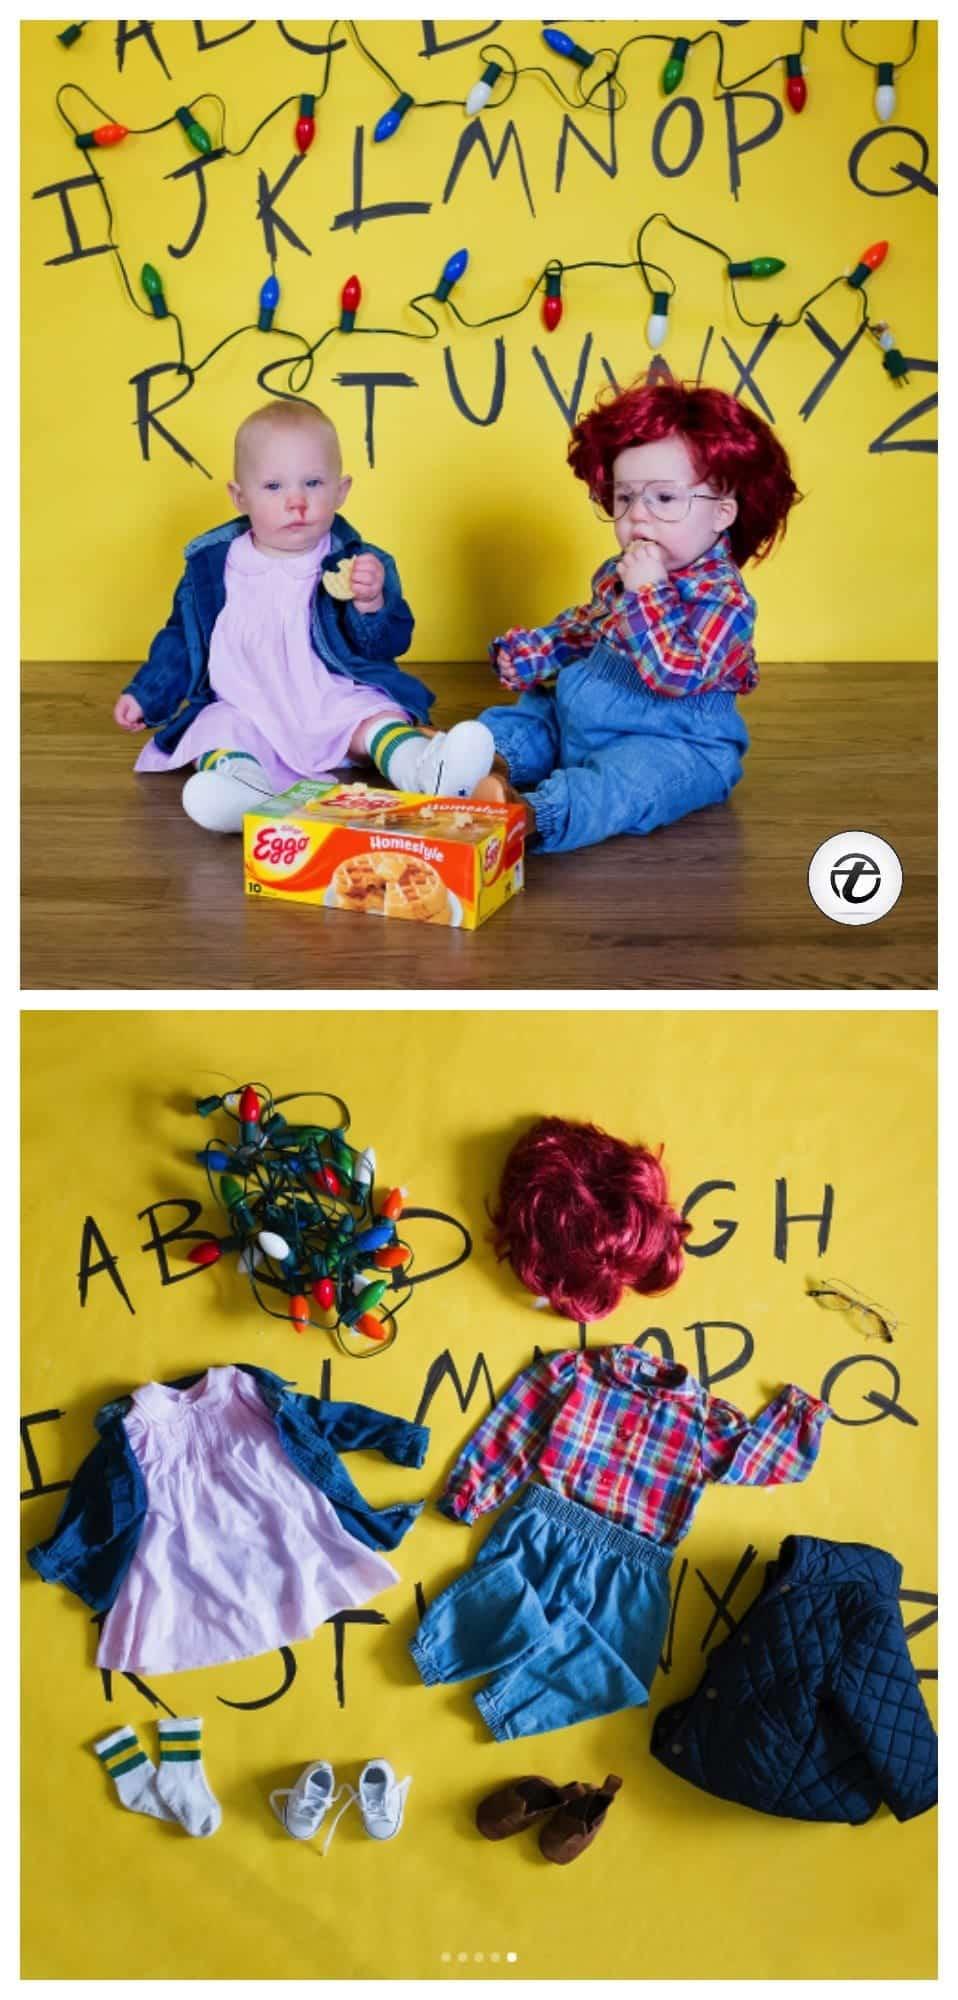 stranger-things-halloween-costumes-for-baby-girls Kids Halloween Costumes - Top 10 Halloween Costumes for Kids